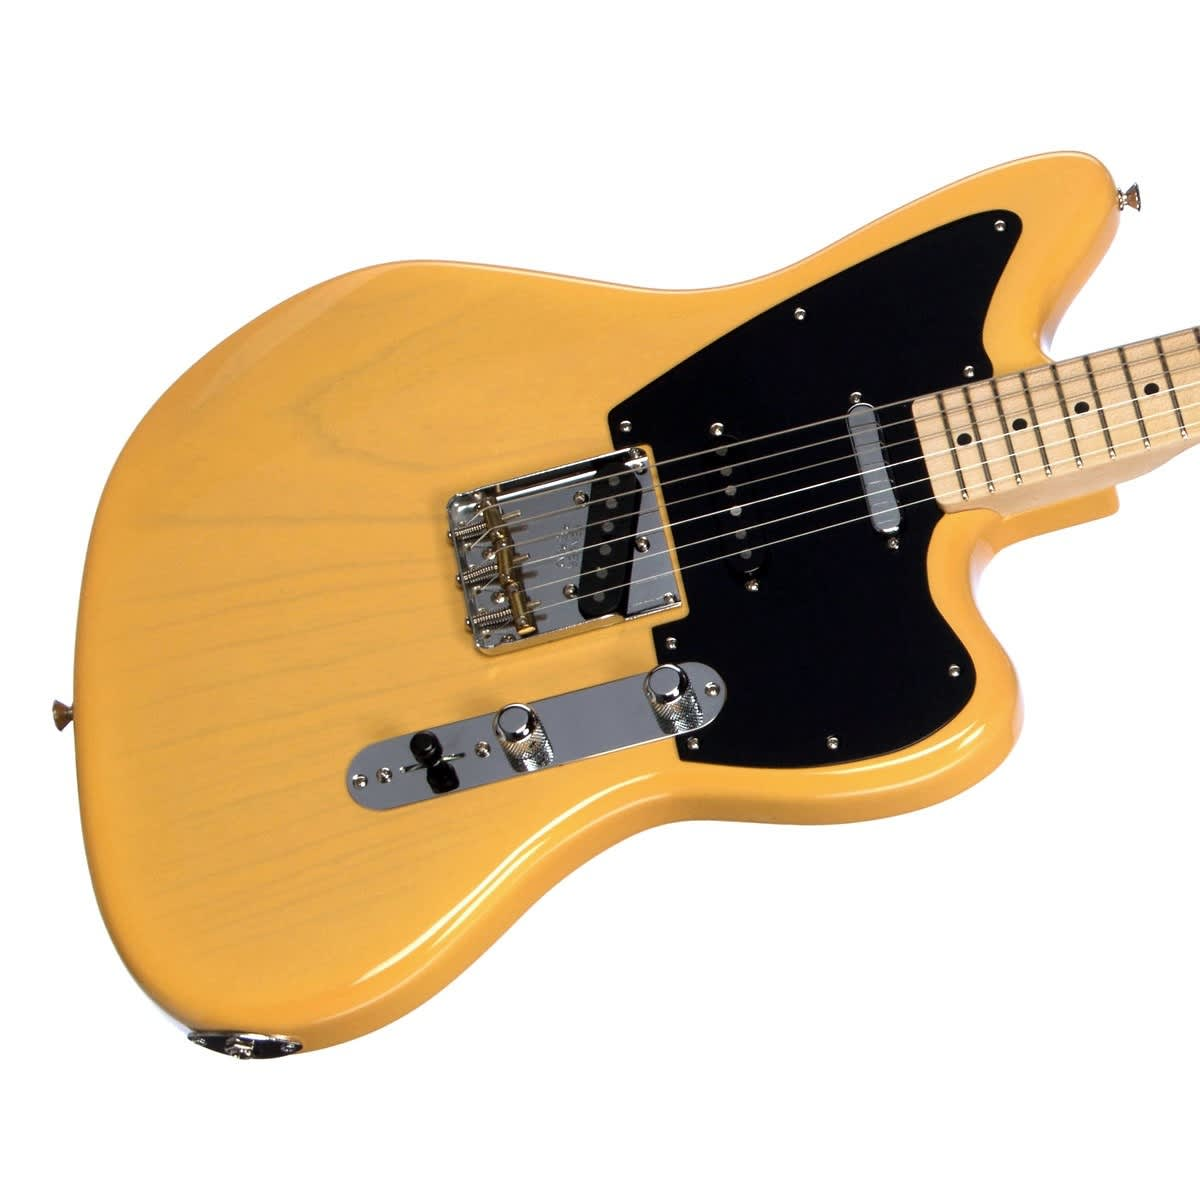 Fender Custom Shop Offset Telecaster Nos Telemaster